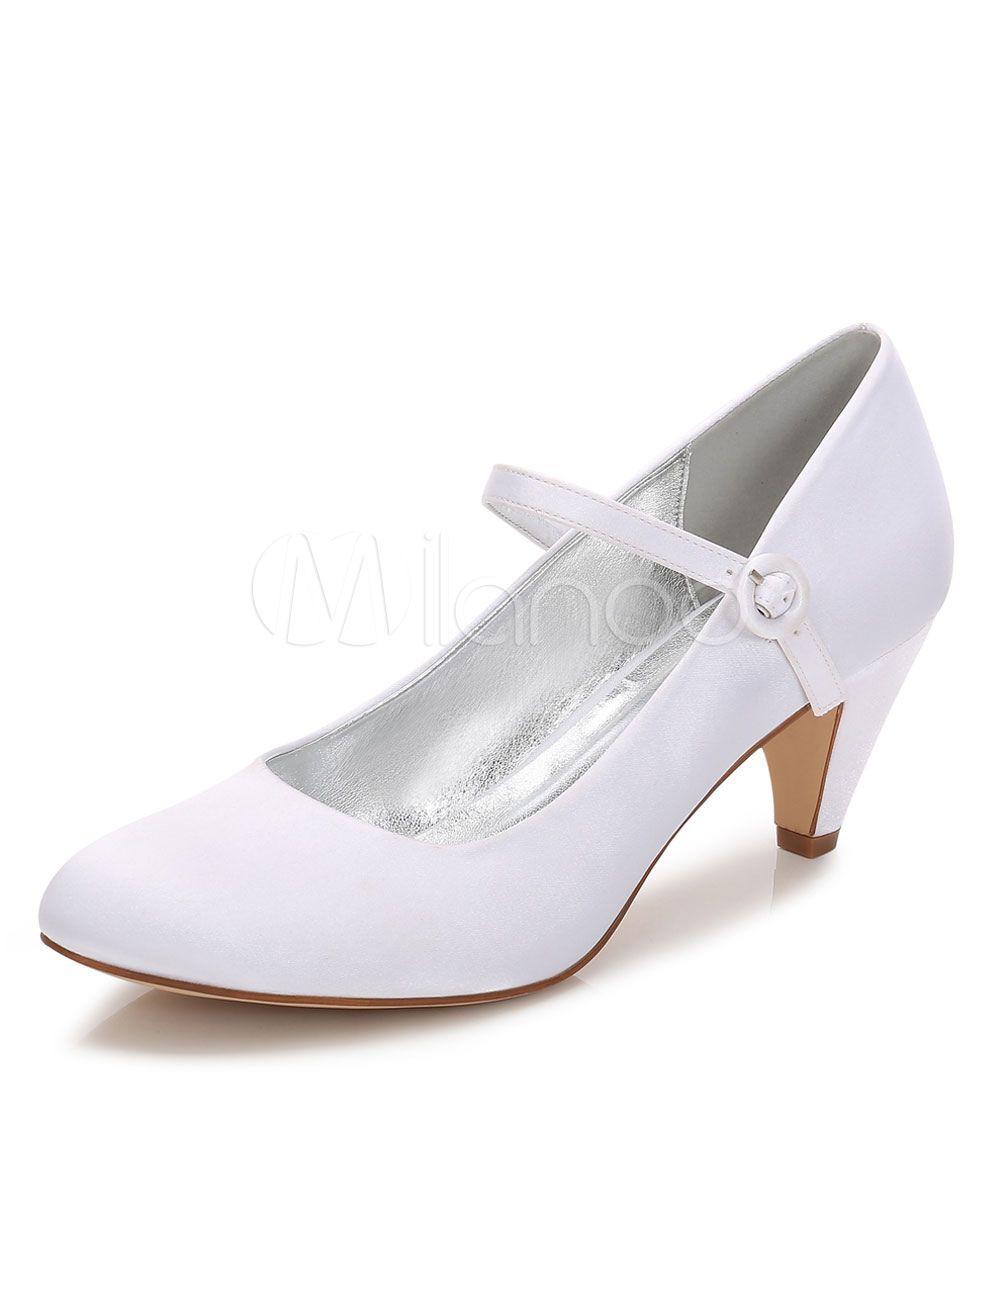 Women Wedding Shoes White Kitten Heels Round Toe Mary Jane Shoes ... 4ebf3acb0